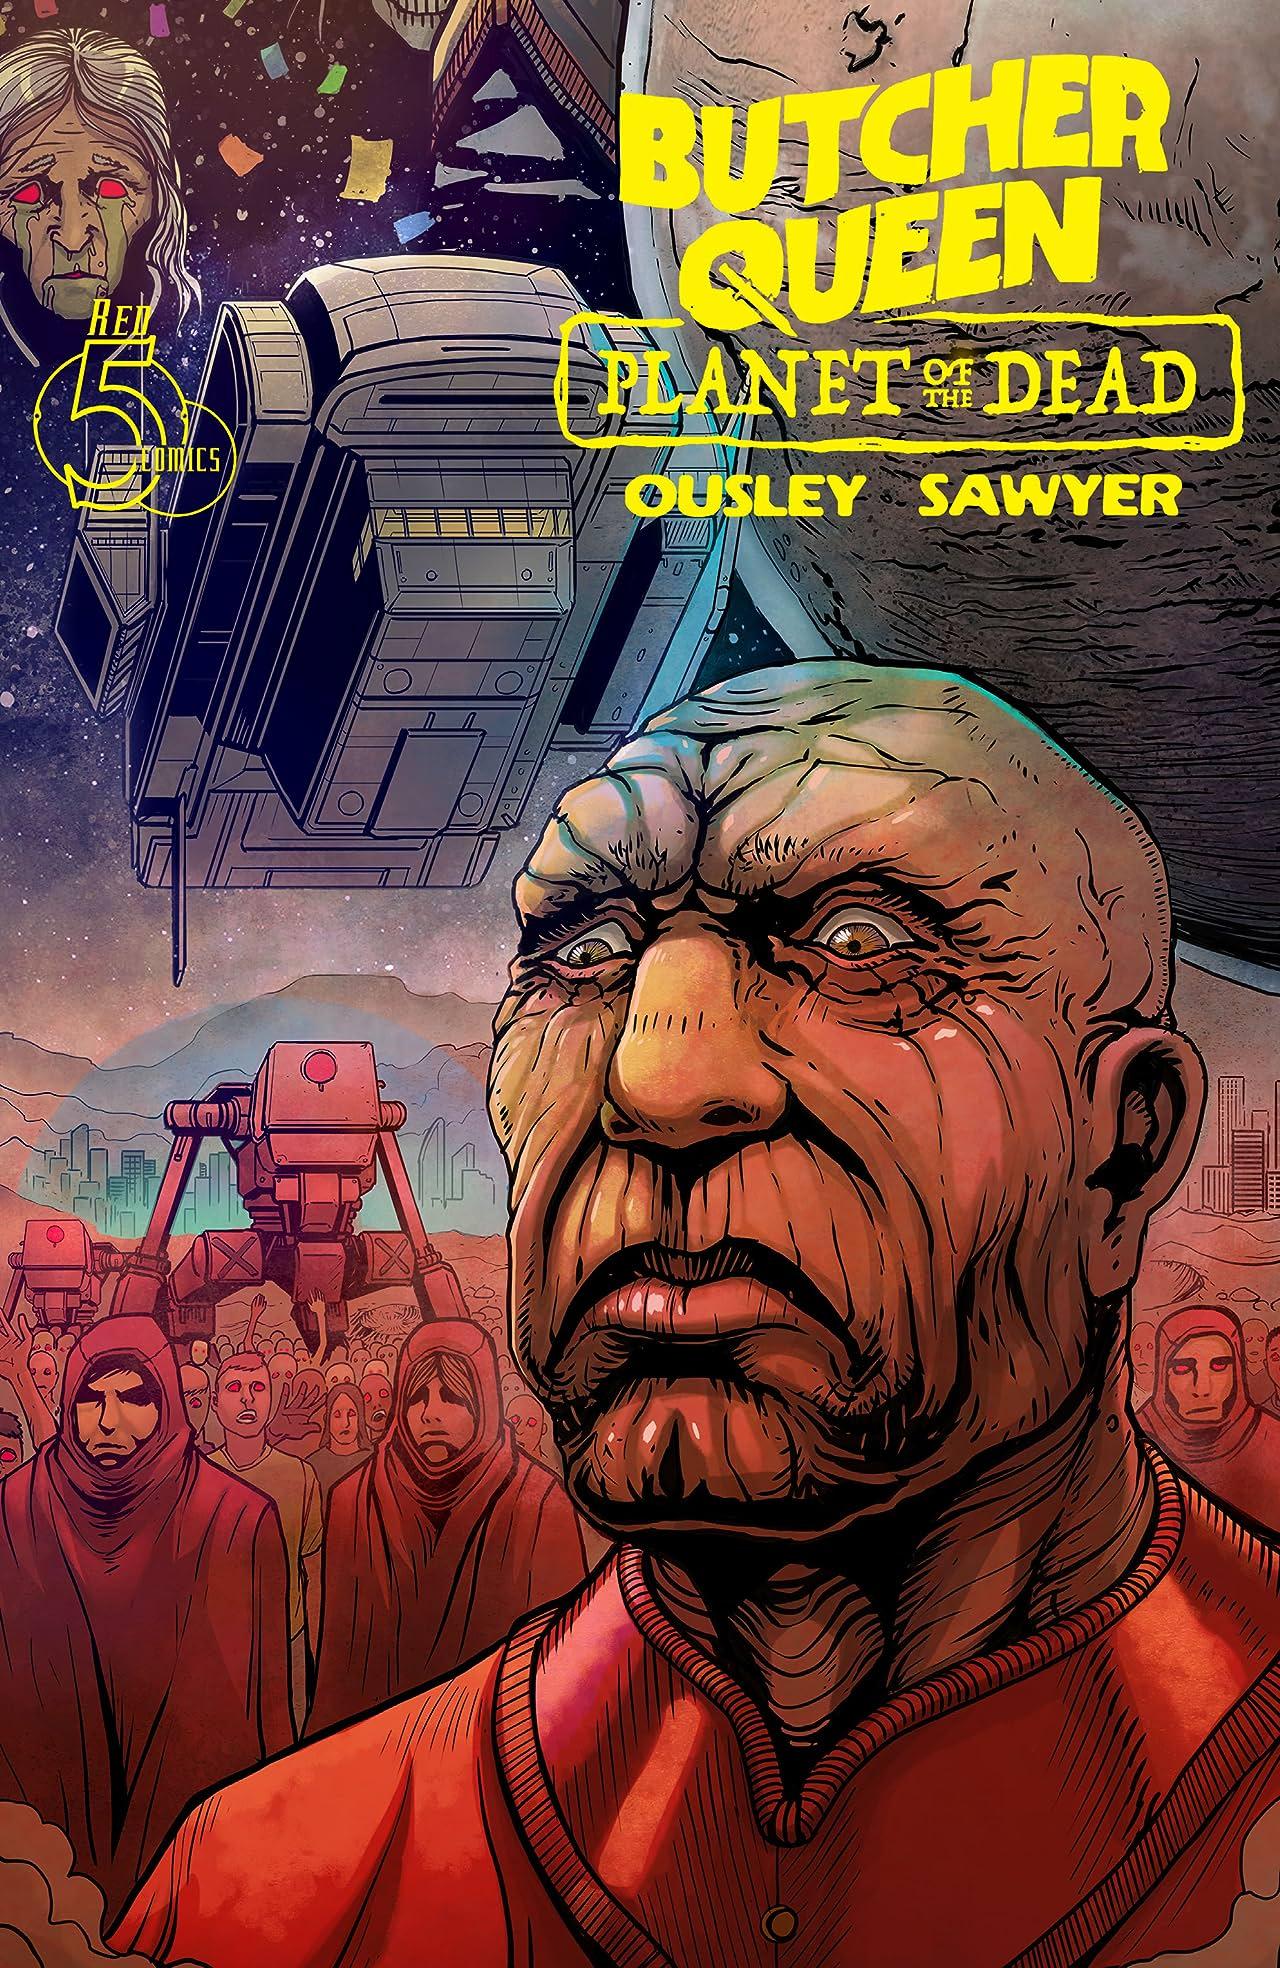 Butcher Queen Vol. 2 #3: Planet of the Dead